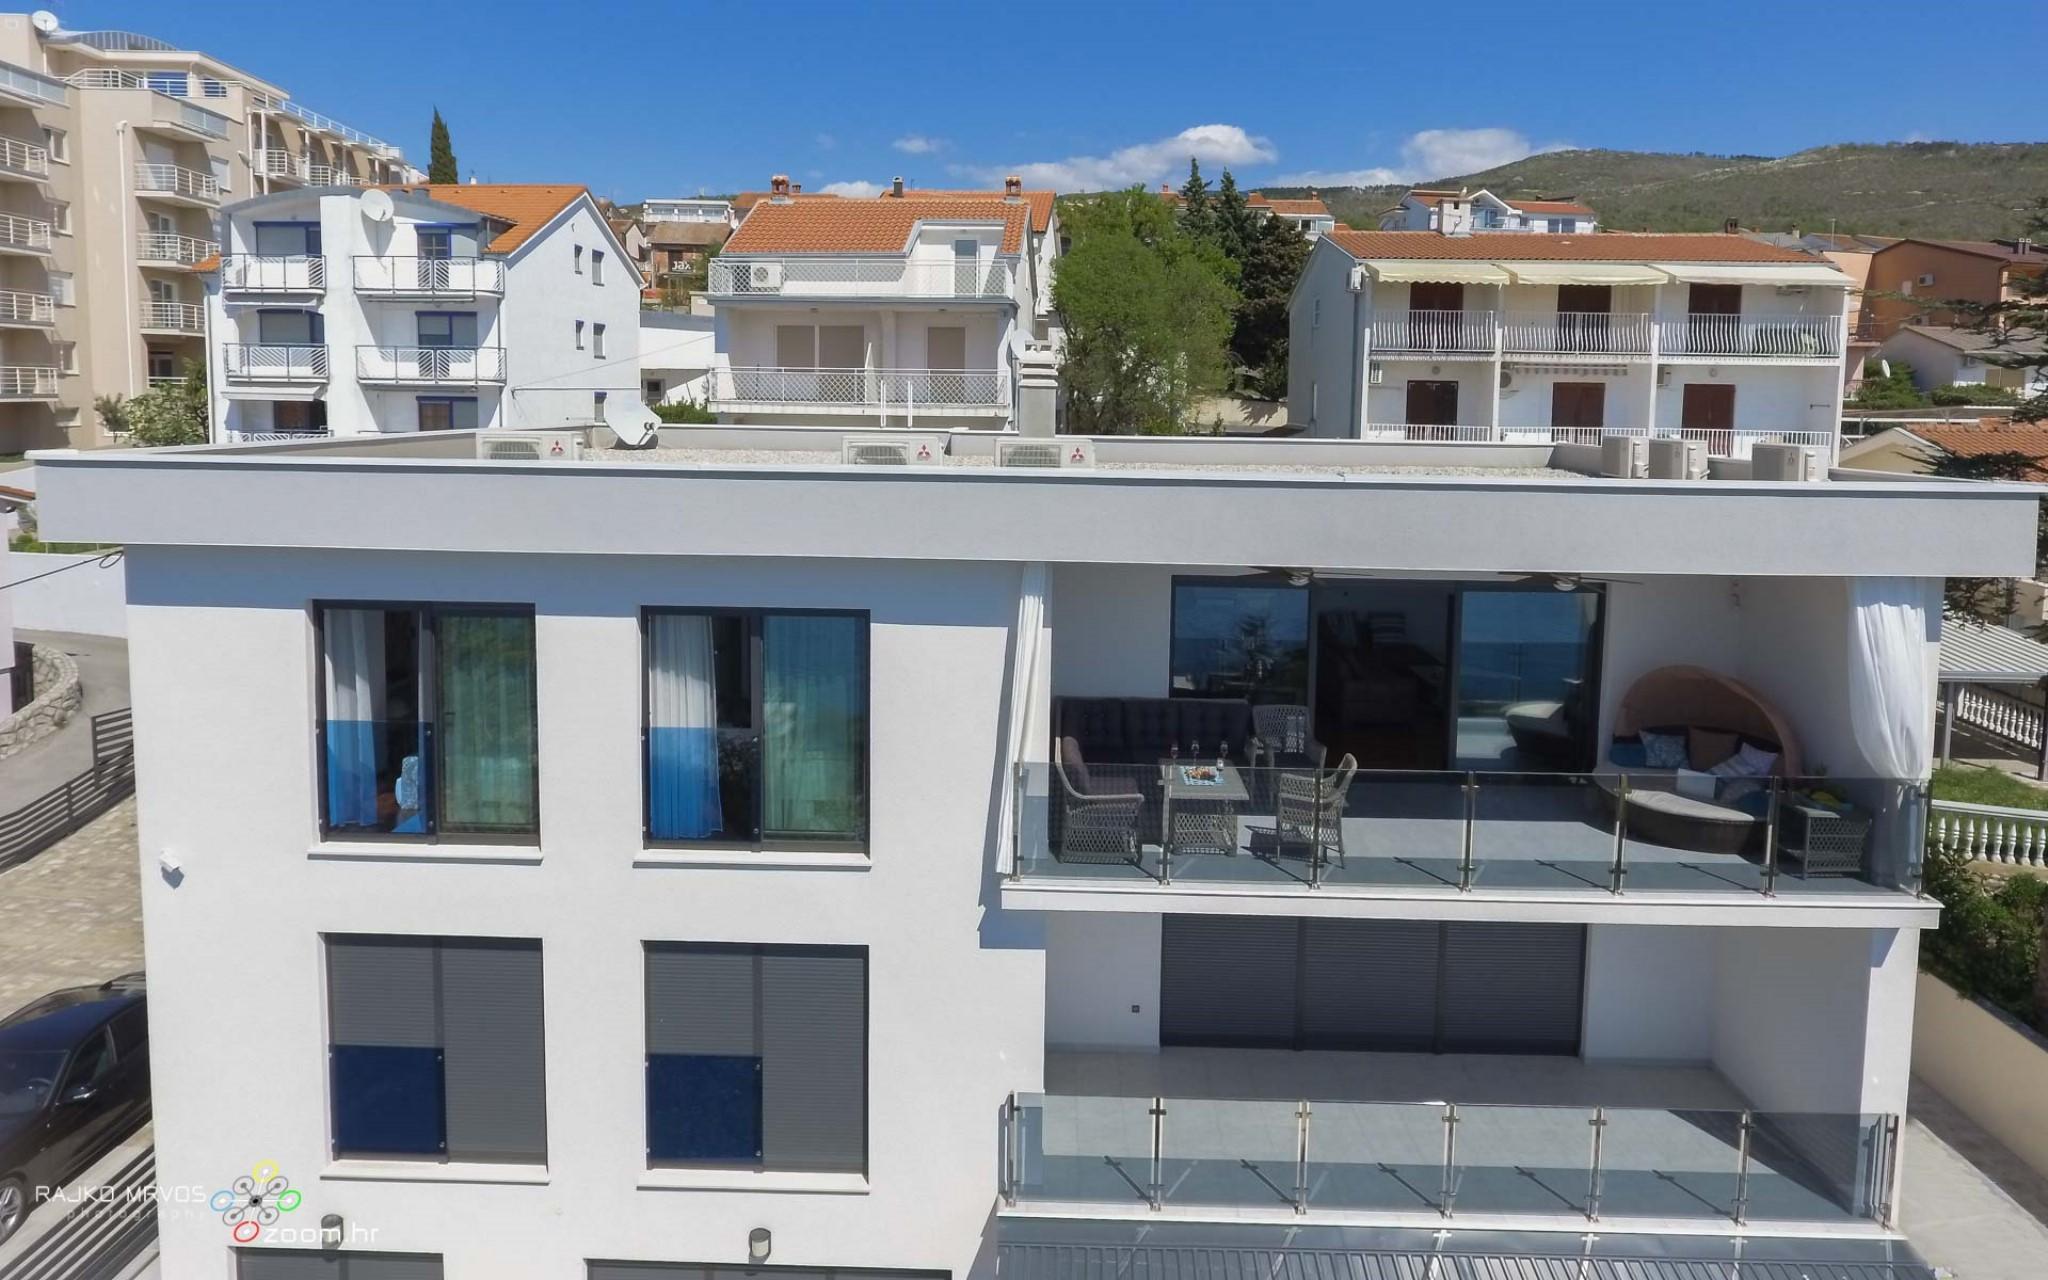 fotografiranje-iz-zraka-eksterijera-dronom-vila-kuca-hotela-apartmana-Larimar-Penthouse-57